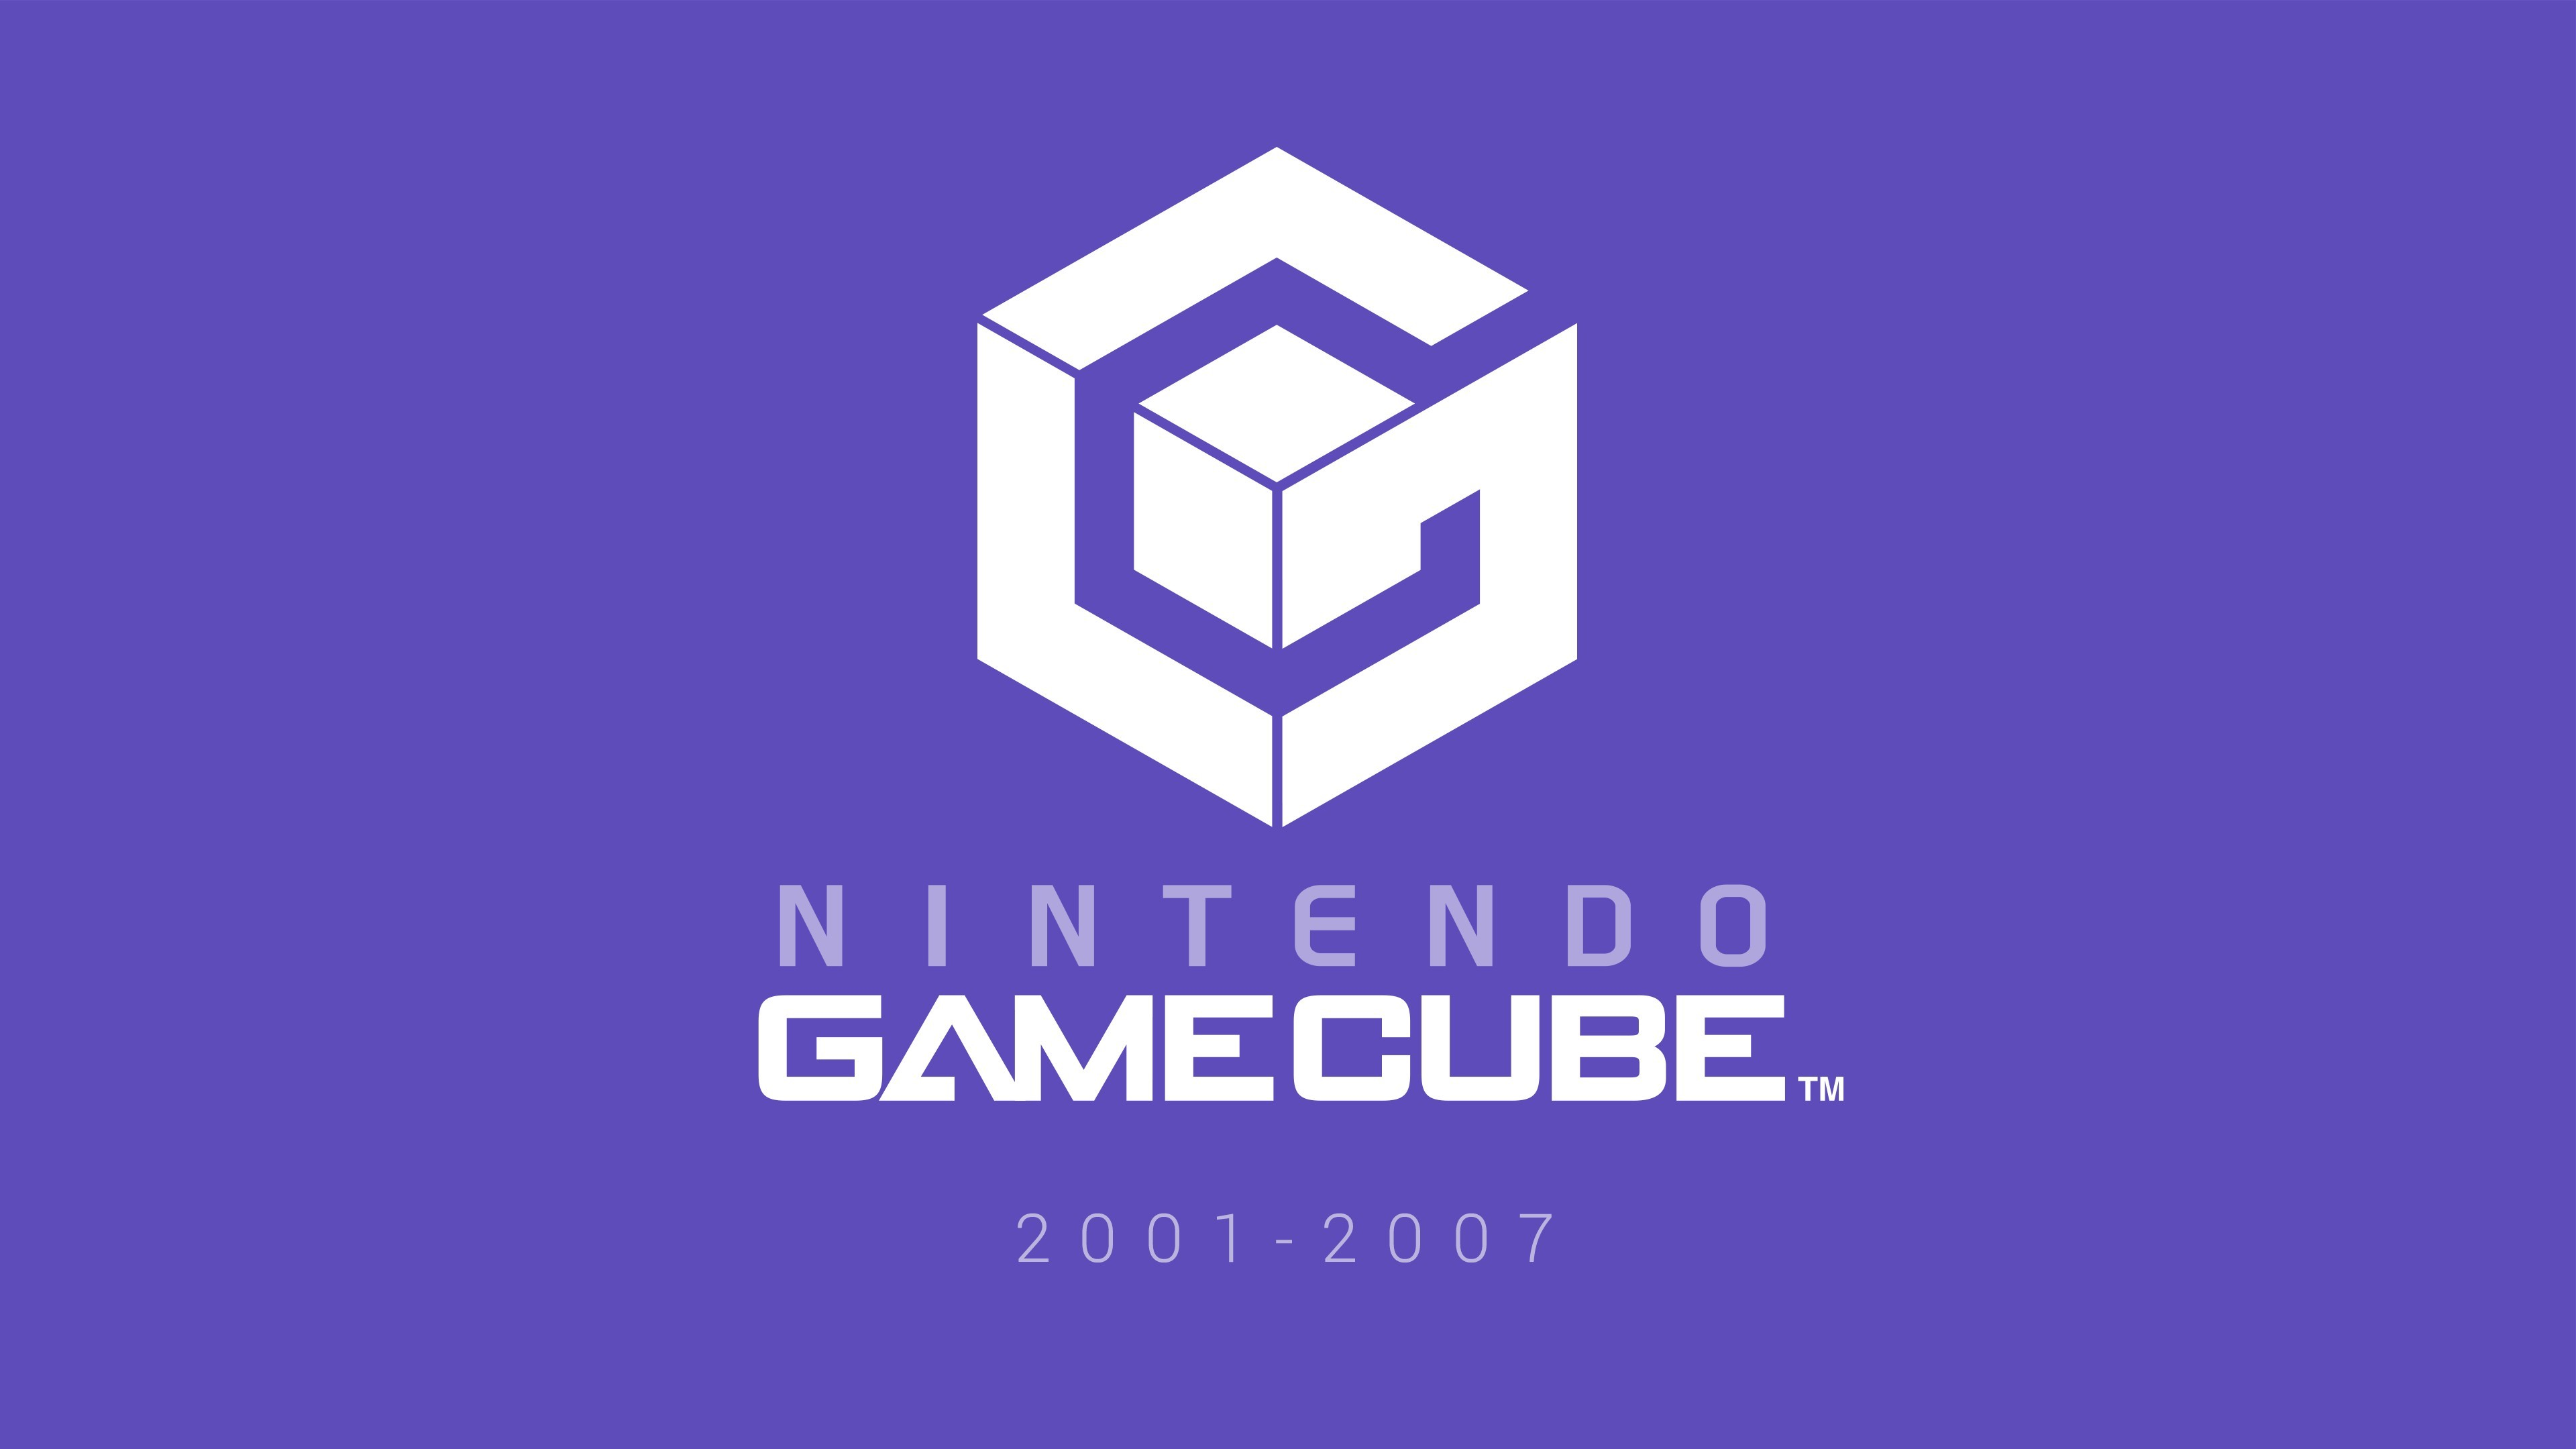 GameCube, Video Games, Nintendo, Logo